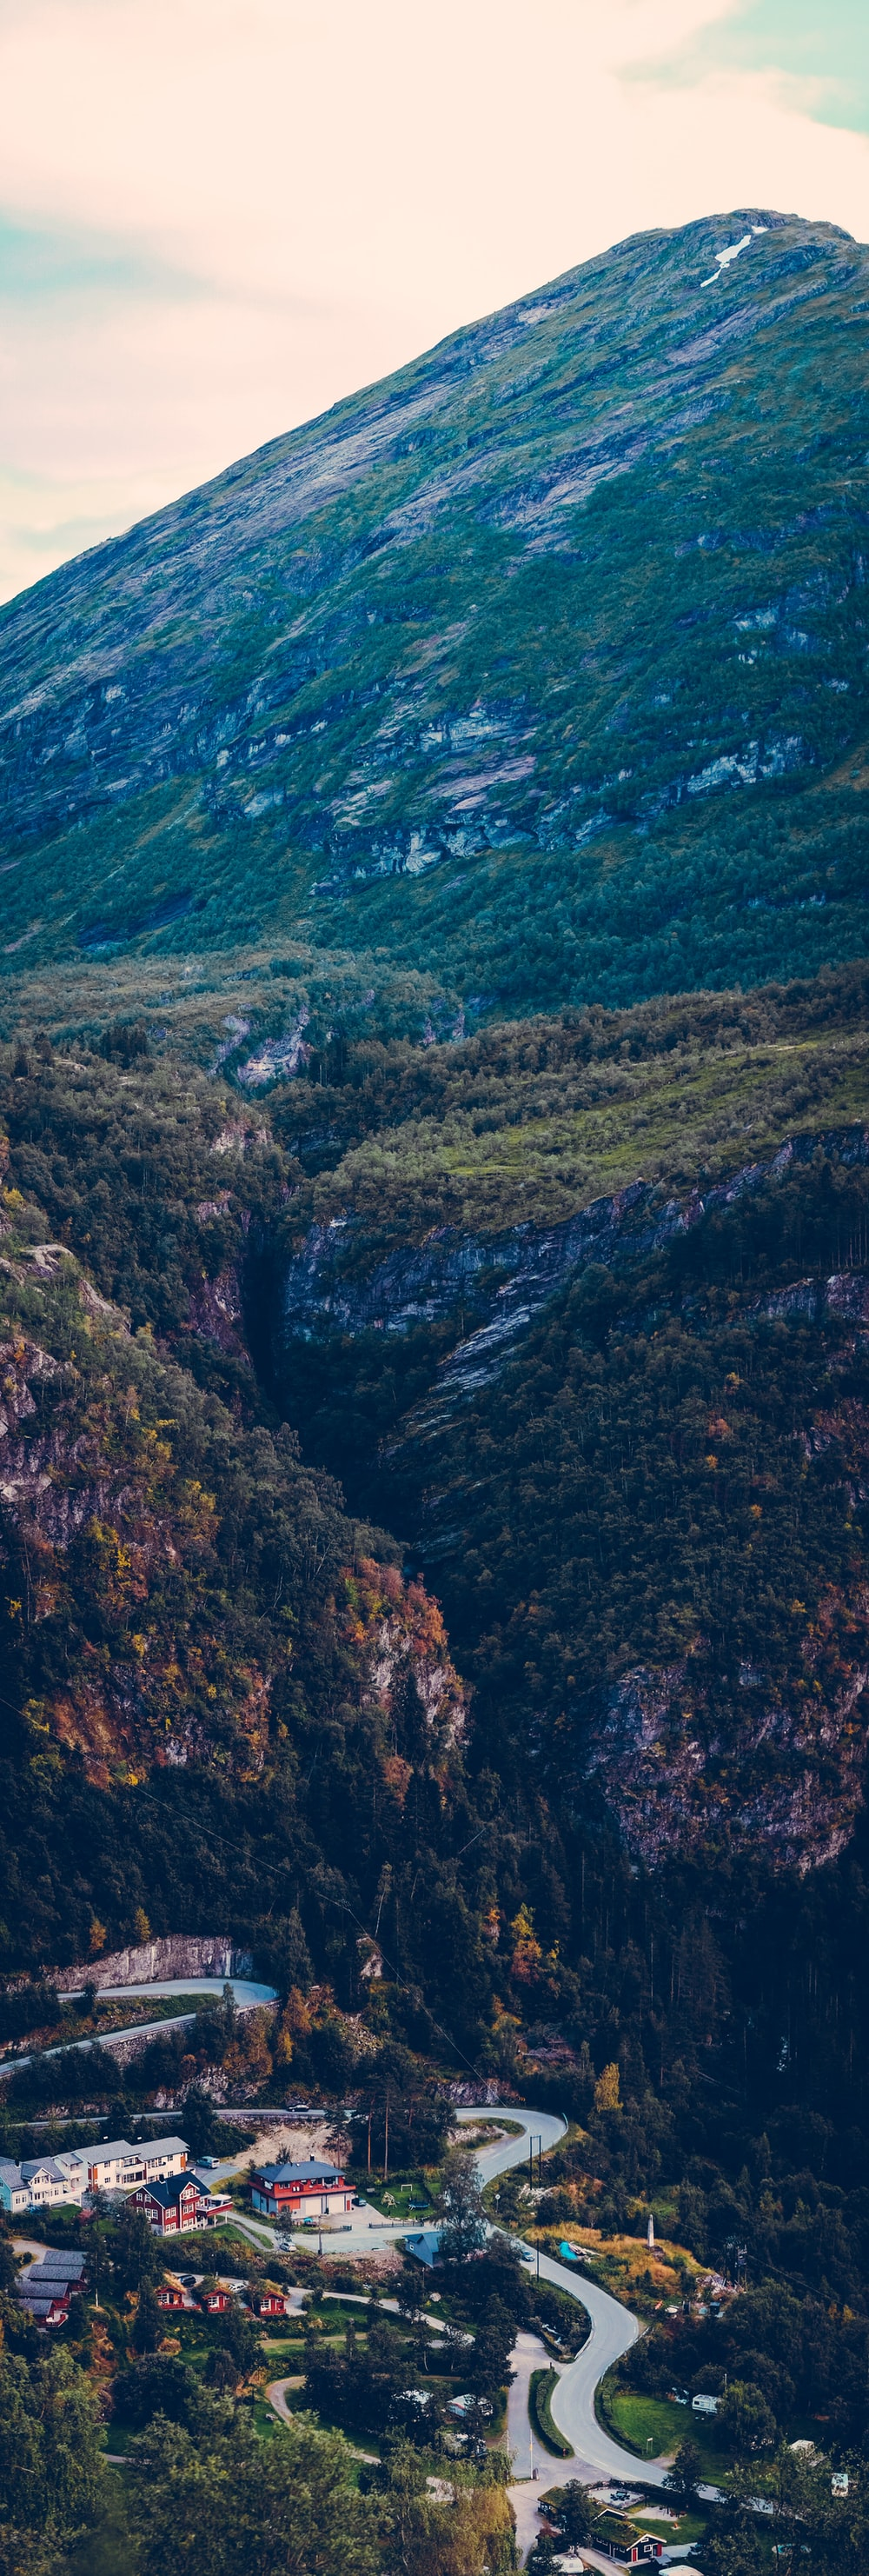 mountain range with wining road